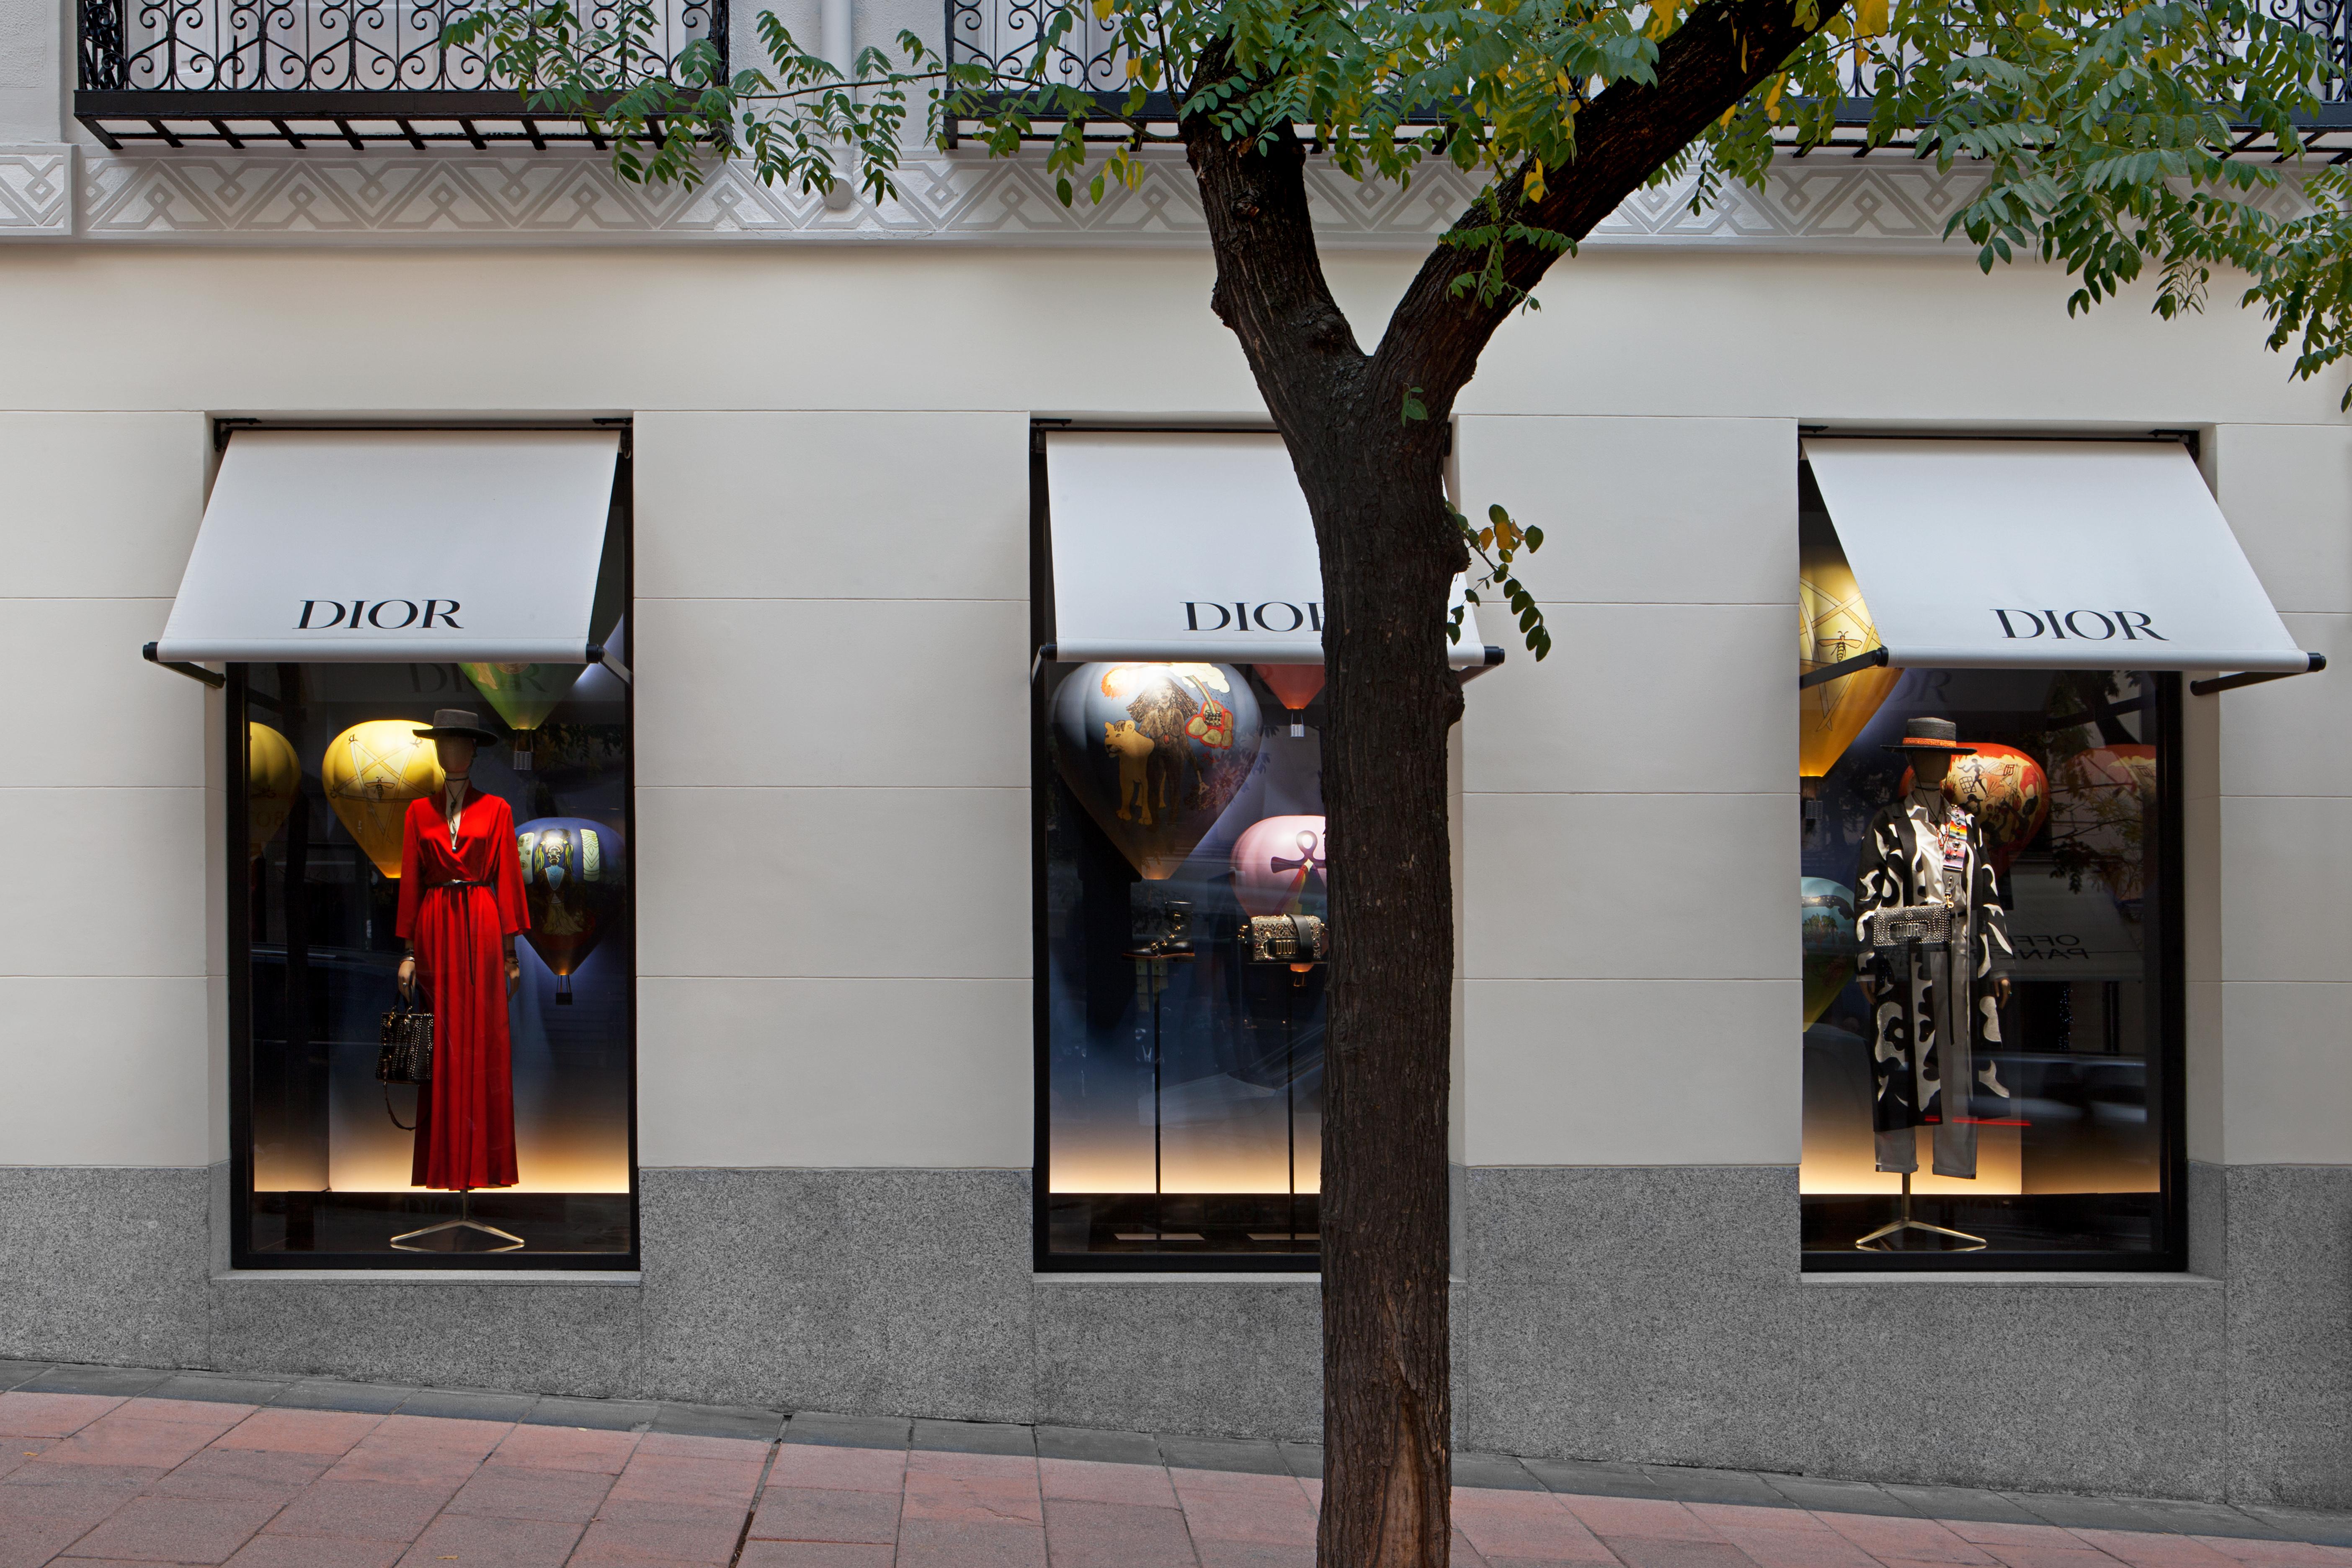 Dior Flagship Store at José Ortega y Gasset